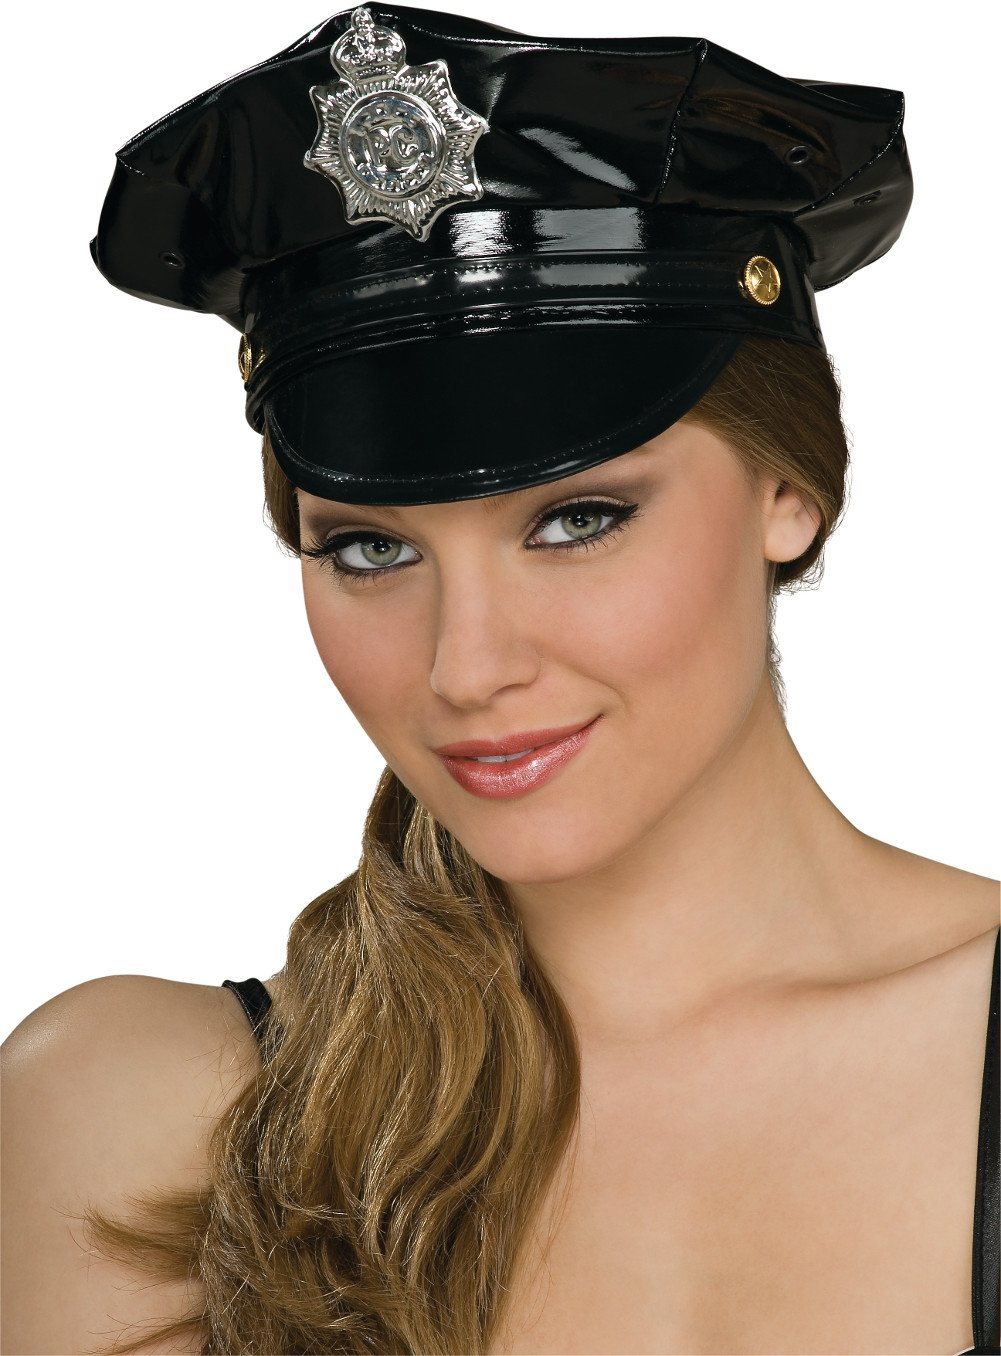 Rubie's Costume Co Black Vinyl Police Hat Costume